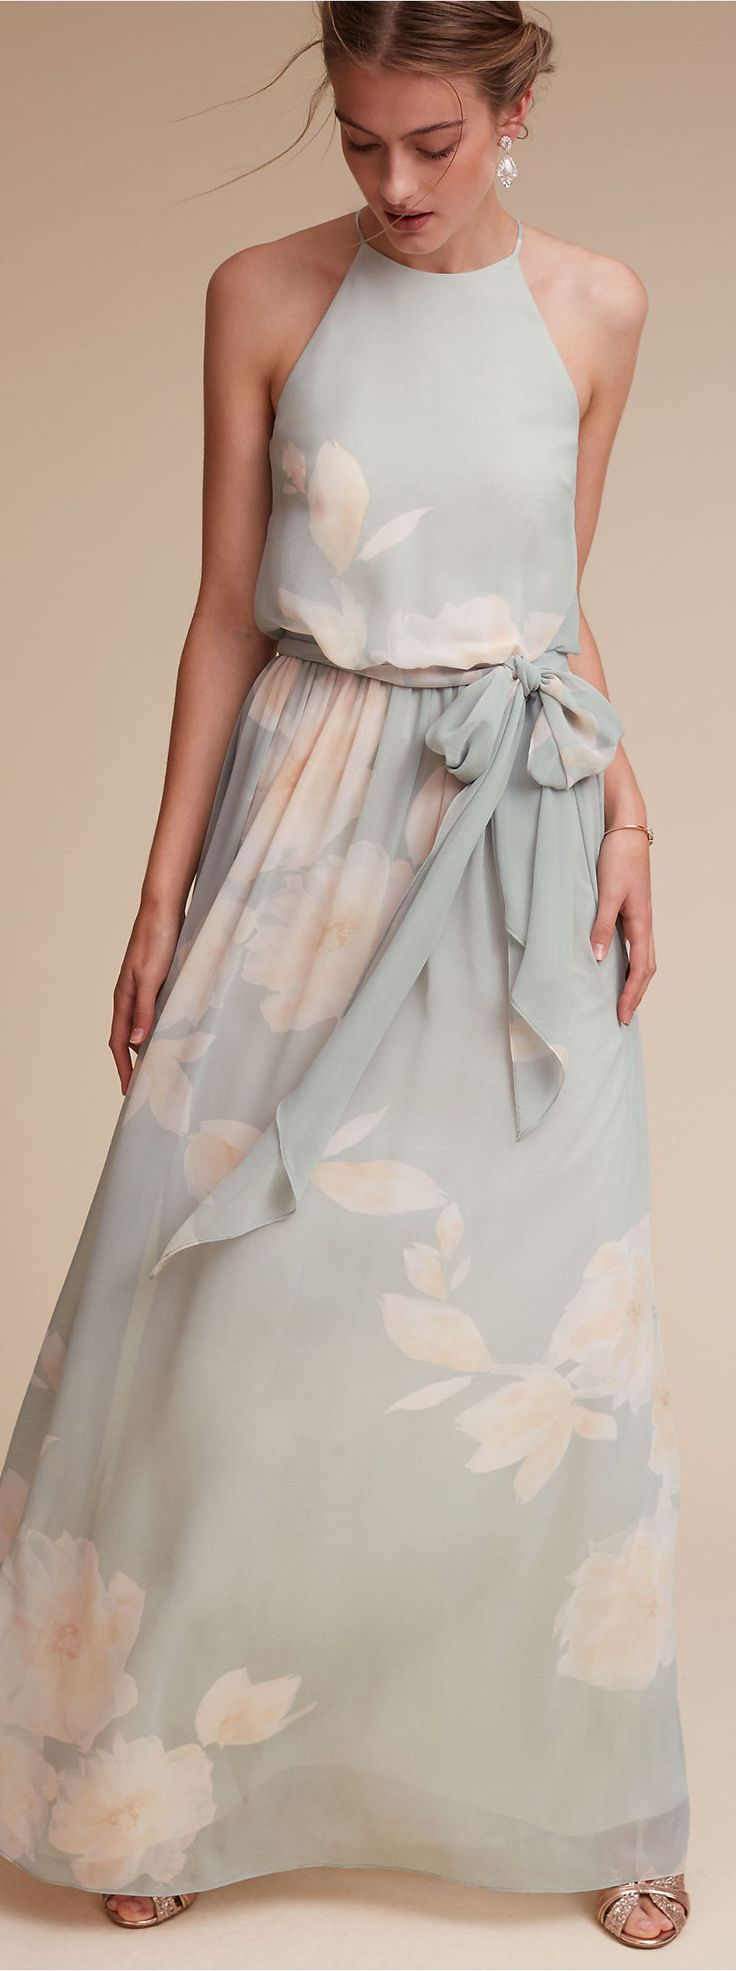 Pastel Floral Bridesmaid Dress | BHLDN